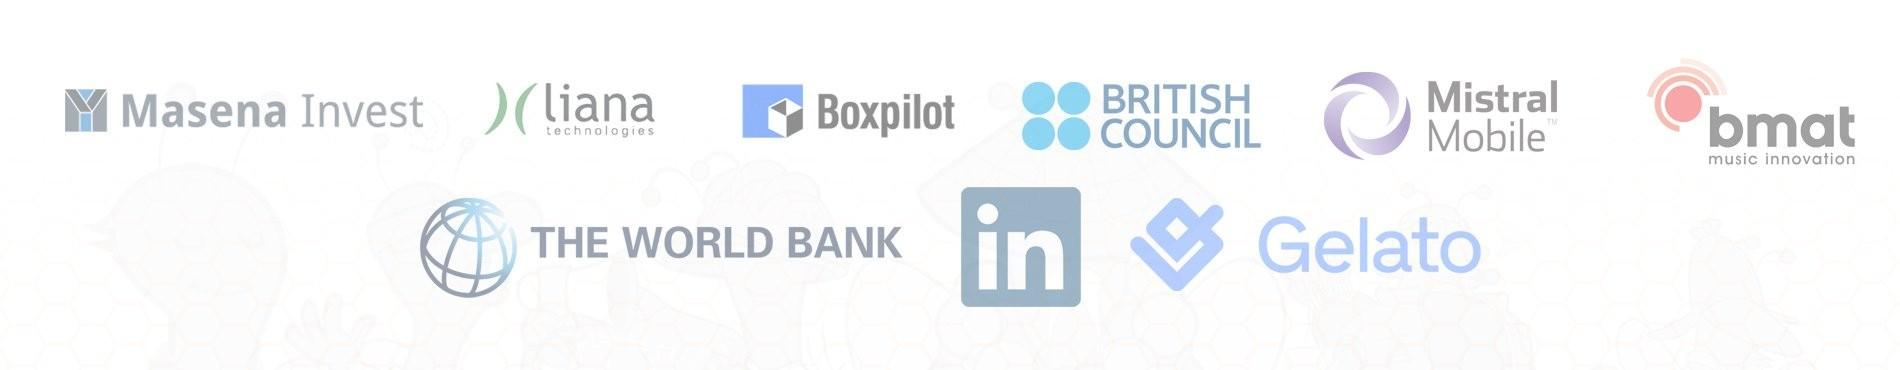 BizzBee Portfolio LinkedIn BMat World Bank Mistral Mobile Masena Invest BoxPilot British Council Liana Technologies Gelato